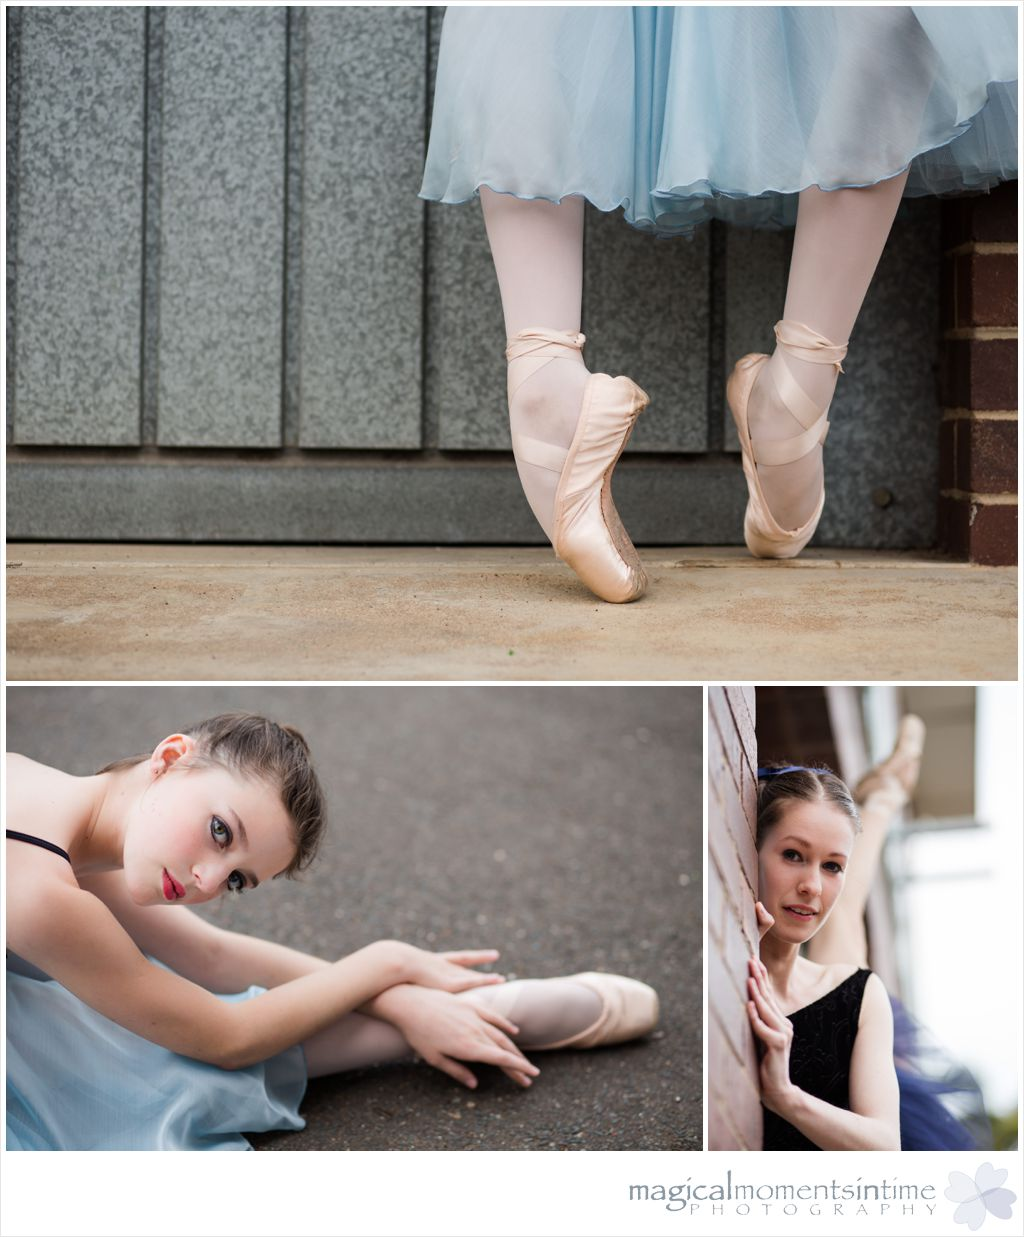 urban ballet hits durban streets